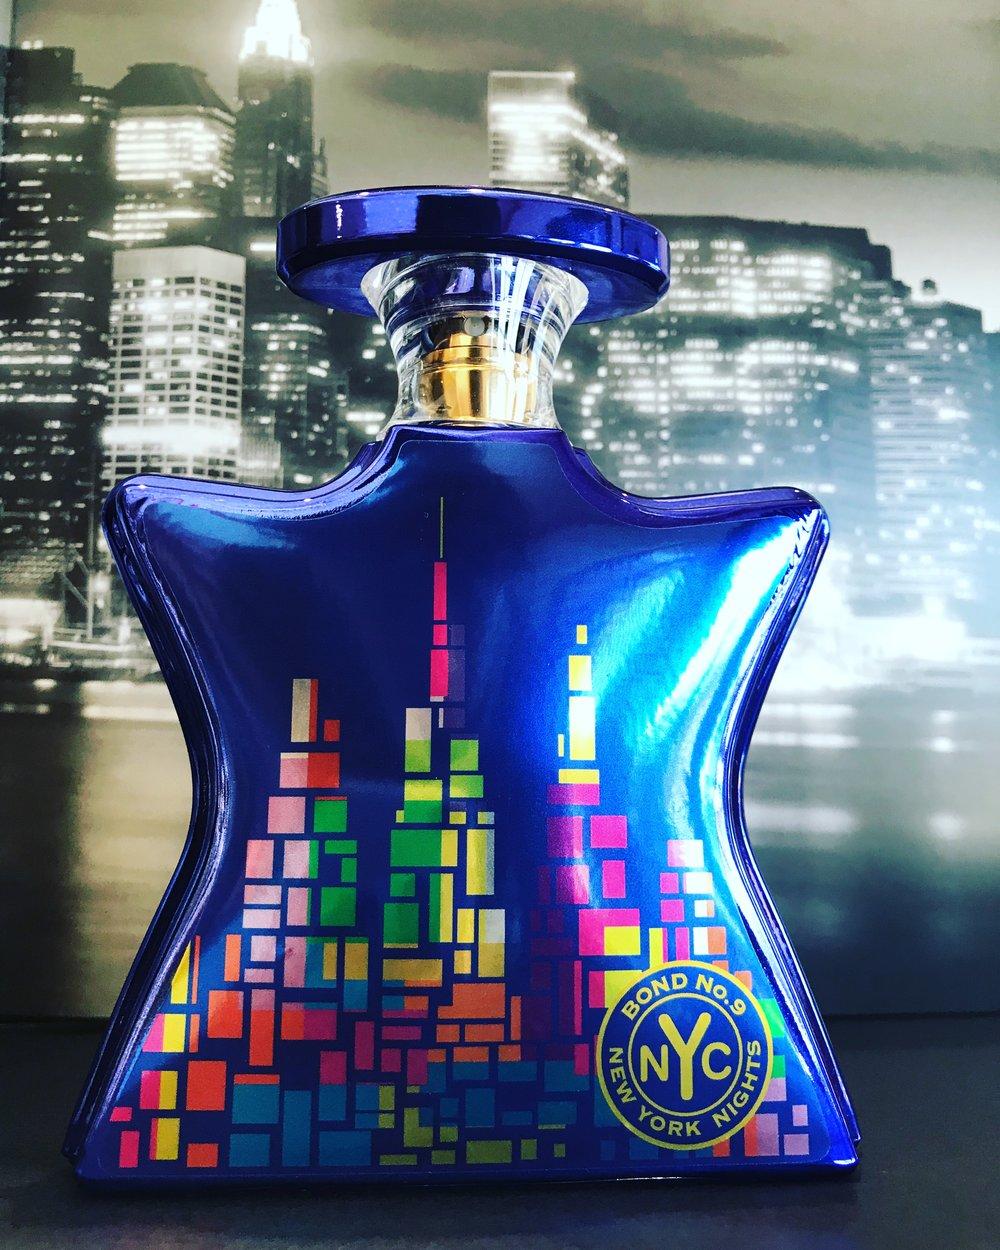 Bond No 9 Fragrance starting at $215